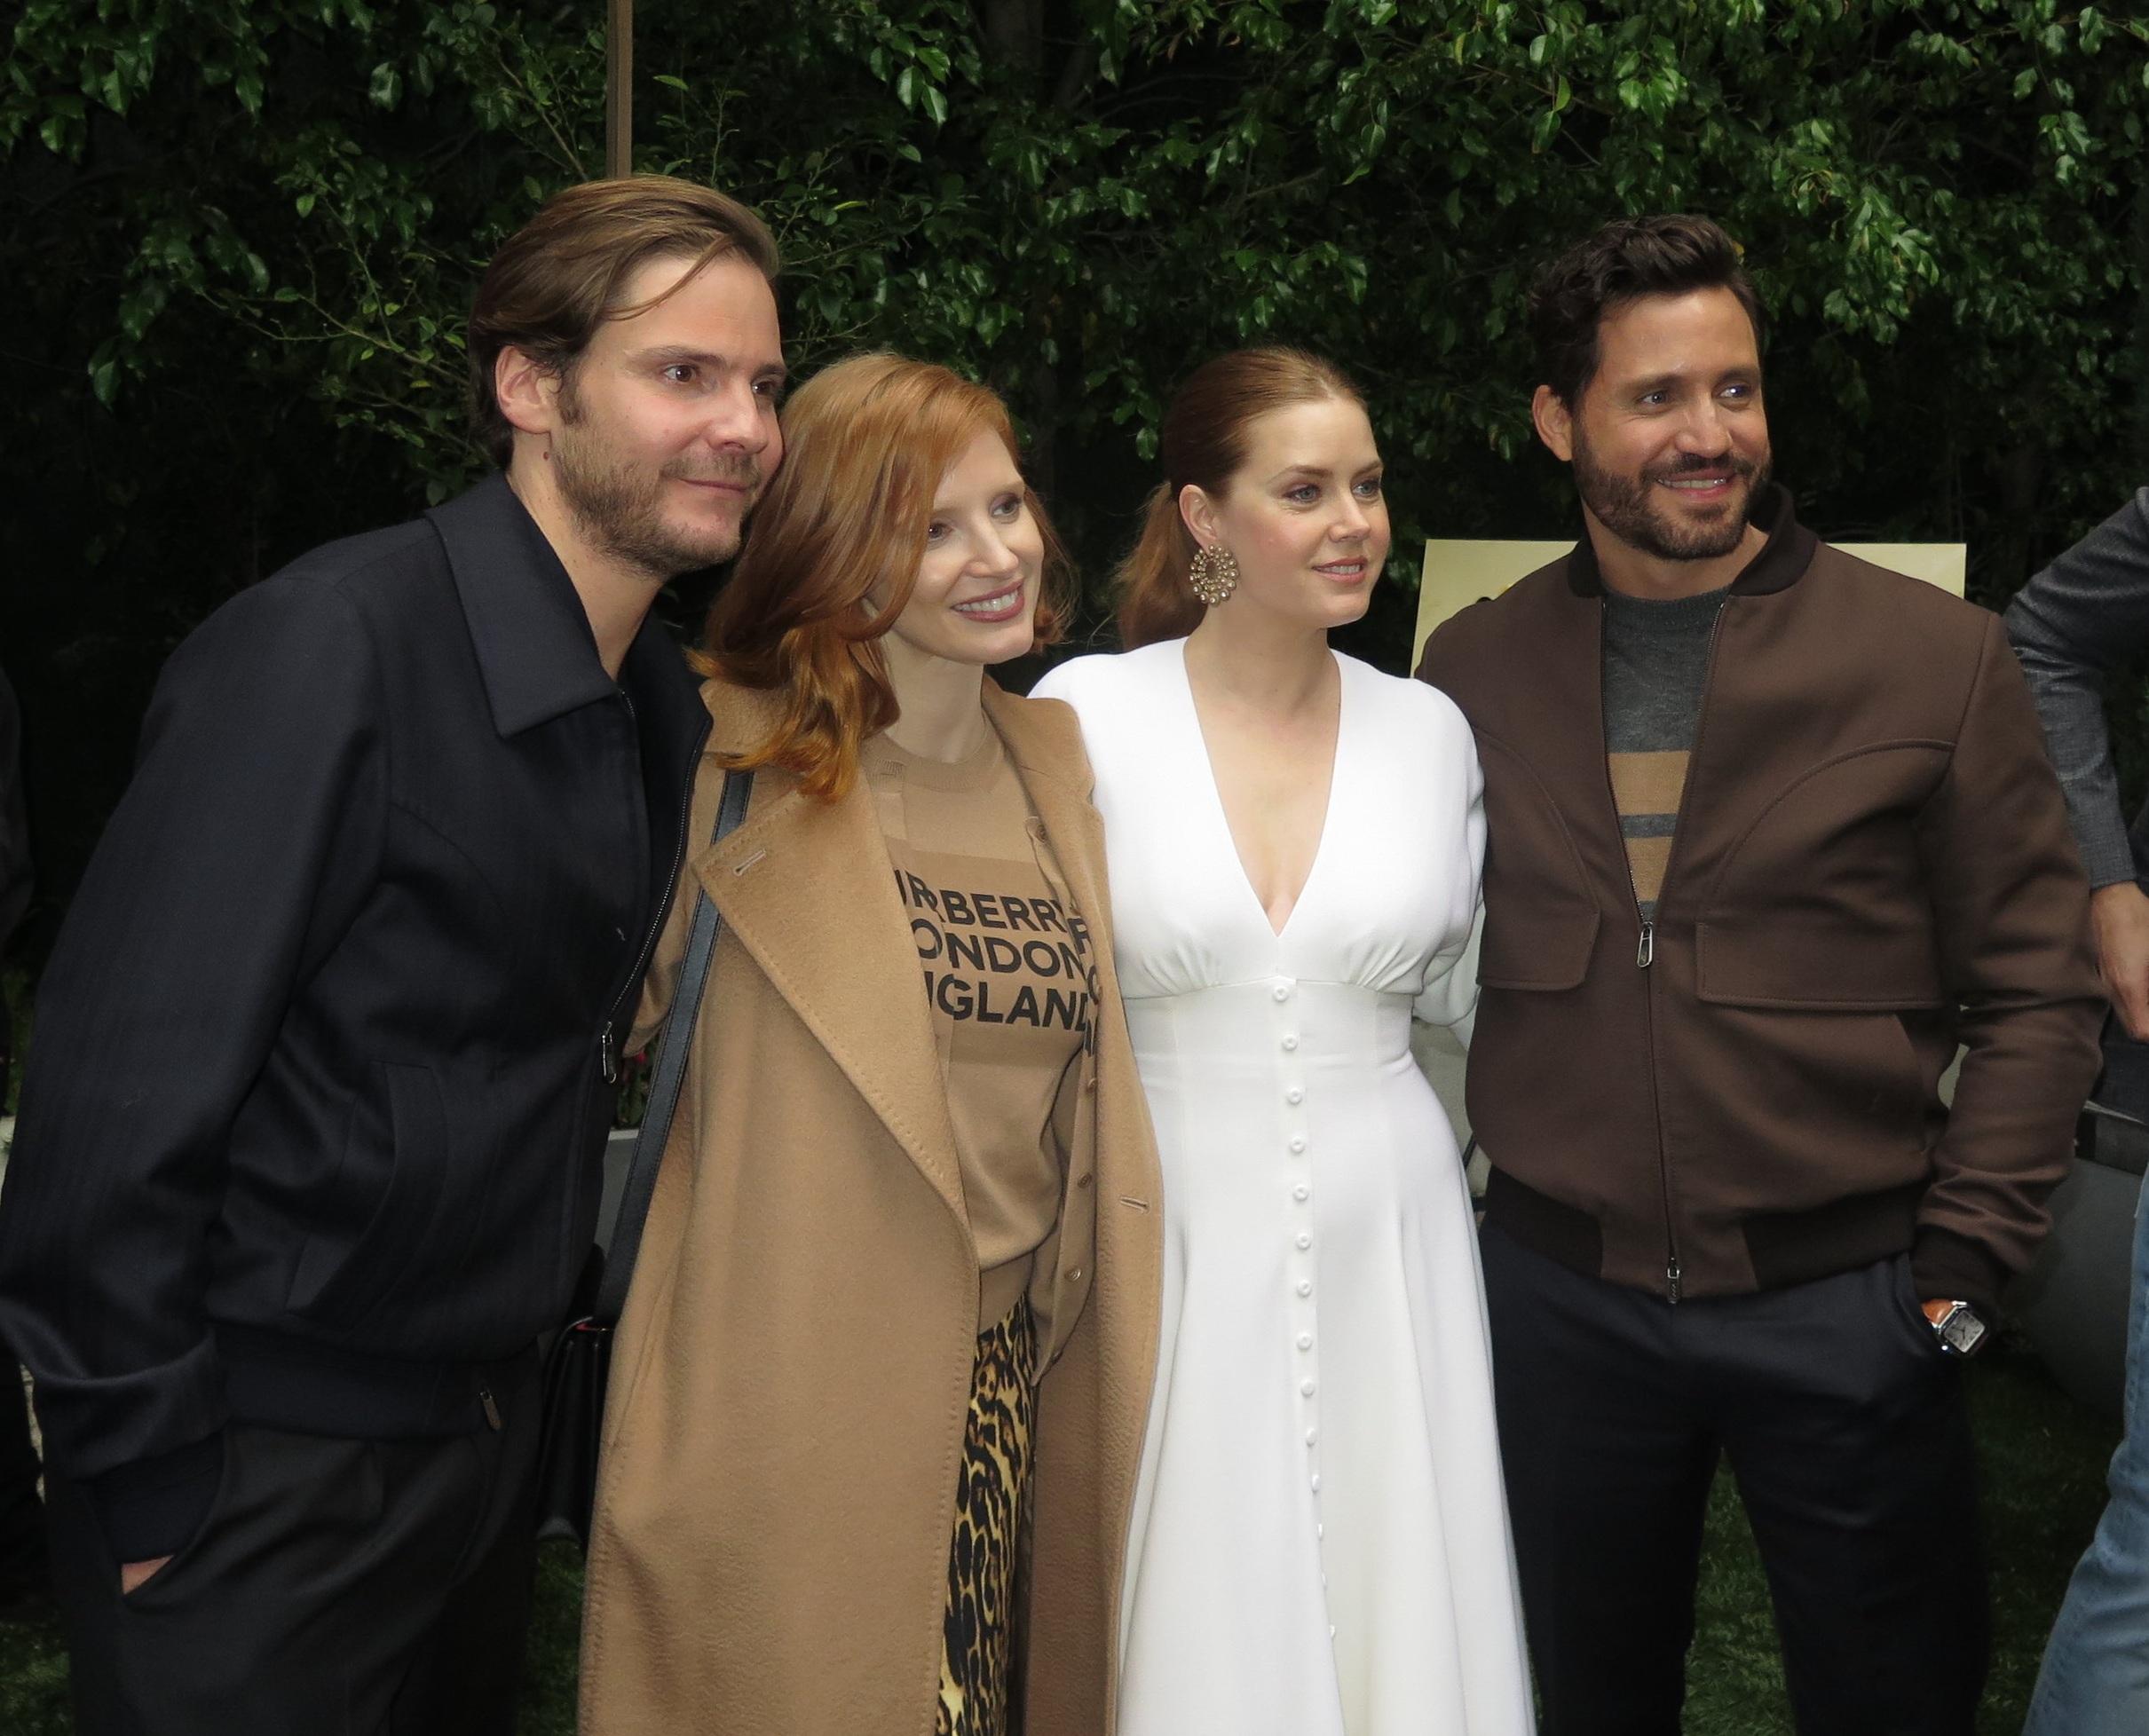 Daniel Bruhl, Jessica Chastain, Amy Adams  and  Edgar Ramirez